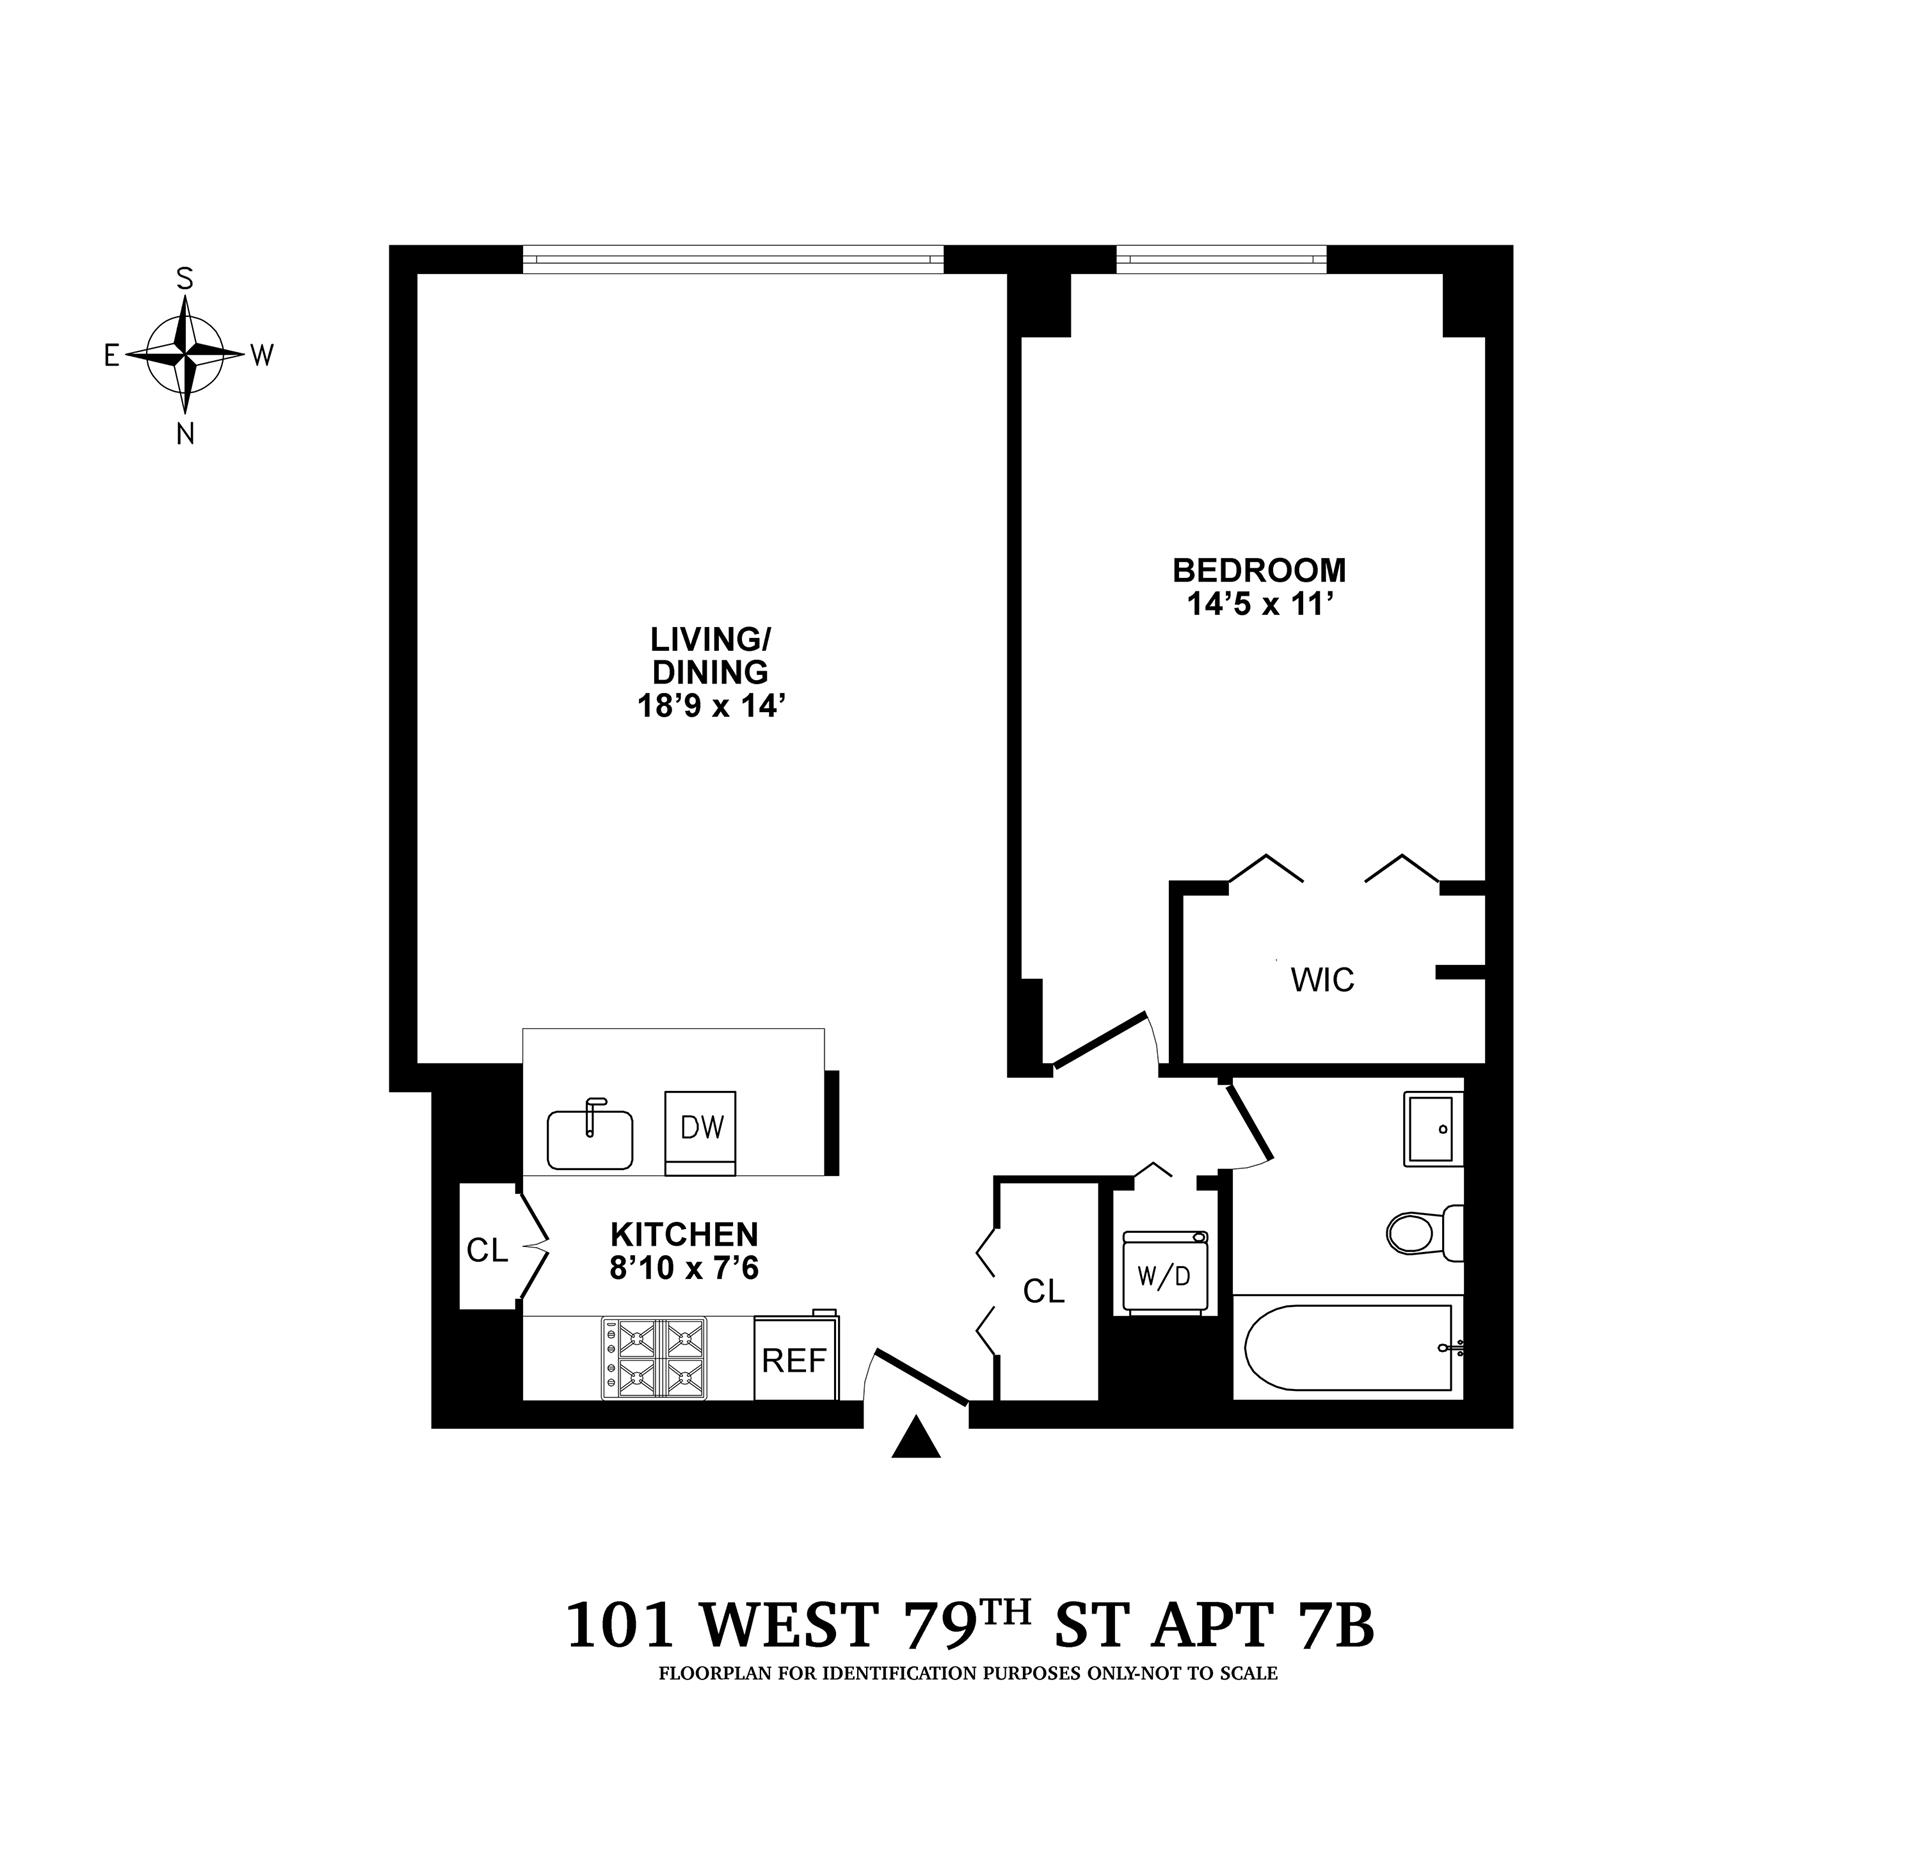 Floor plan of The Park Belvedere, 101 West 79th St, 7B - Upper West Side, New York